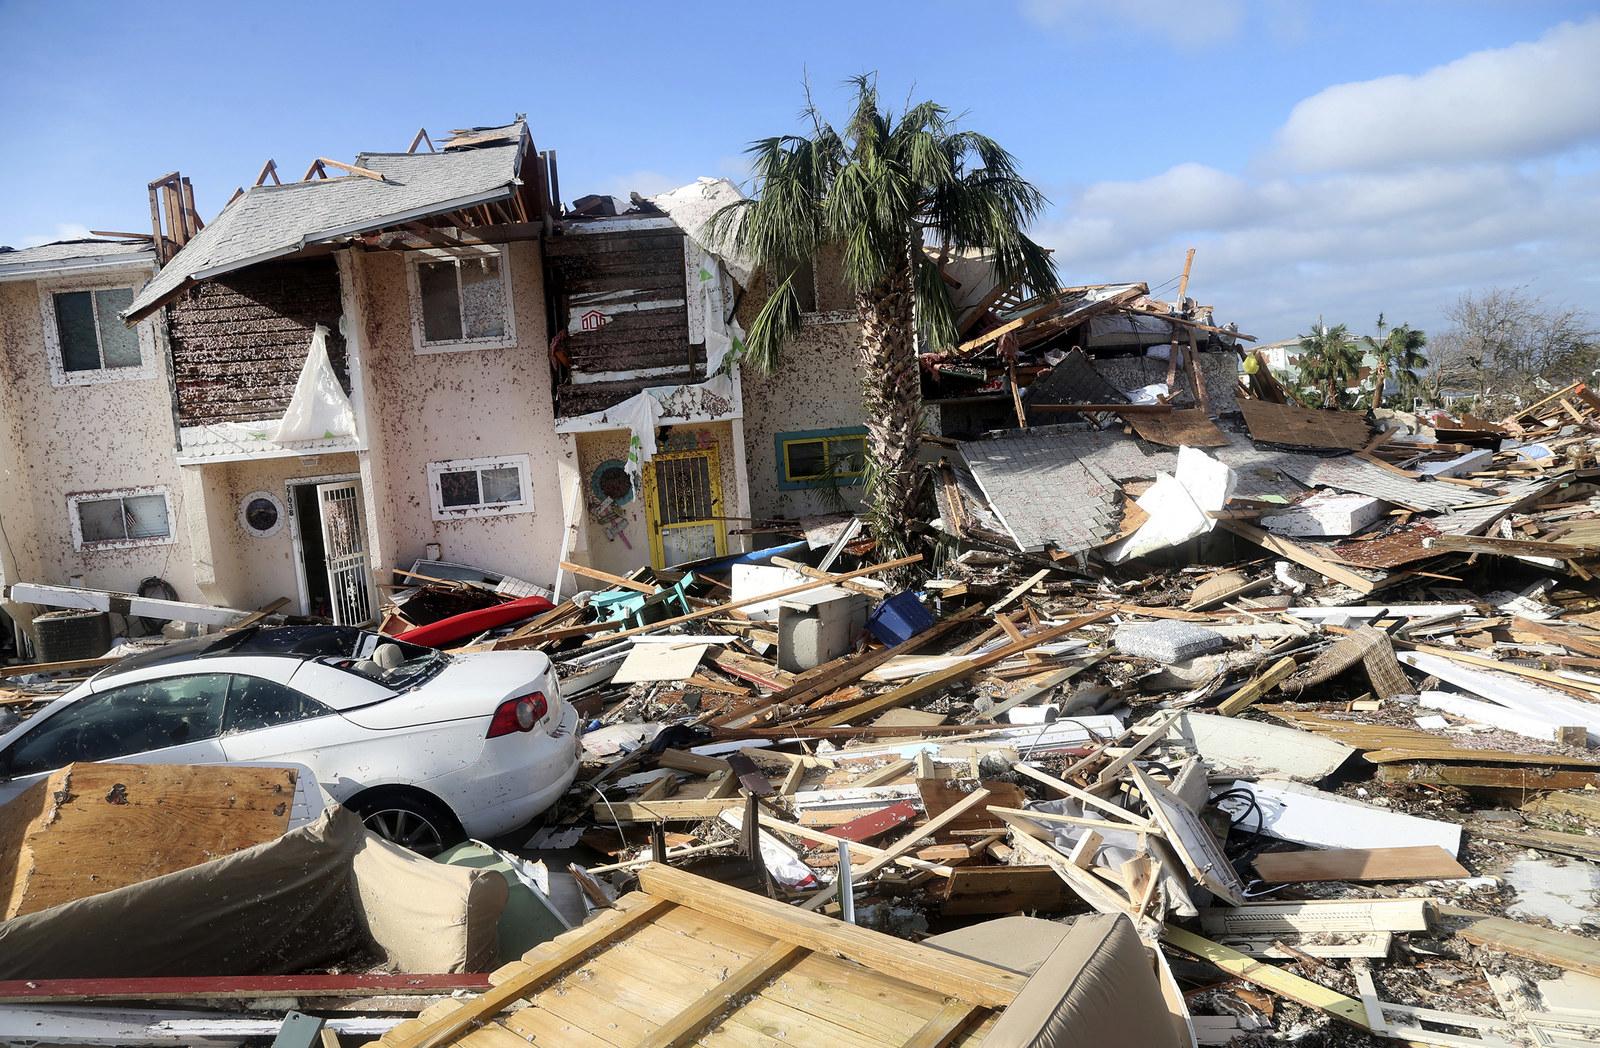 Tragic Images Of Devastation After Historic Hurricane Michael Made Landfall